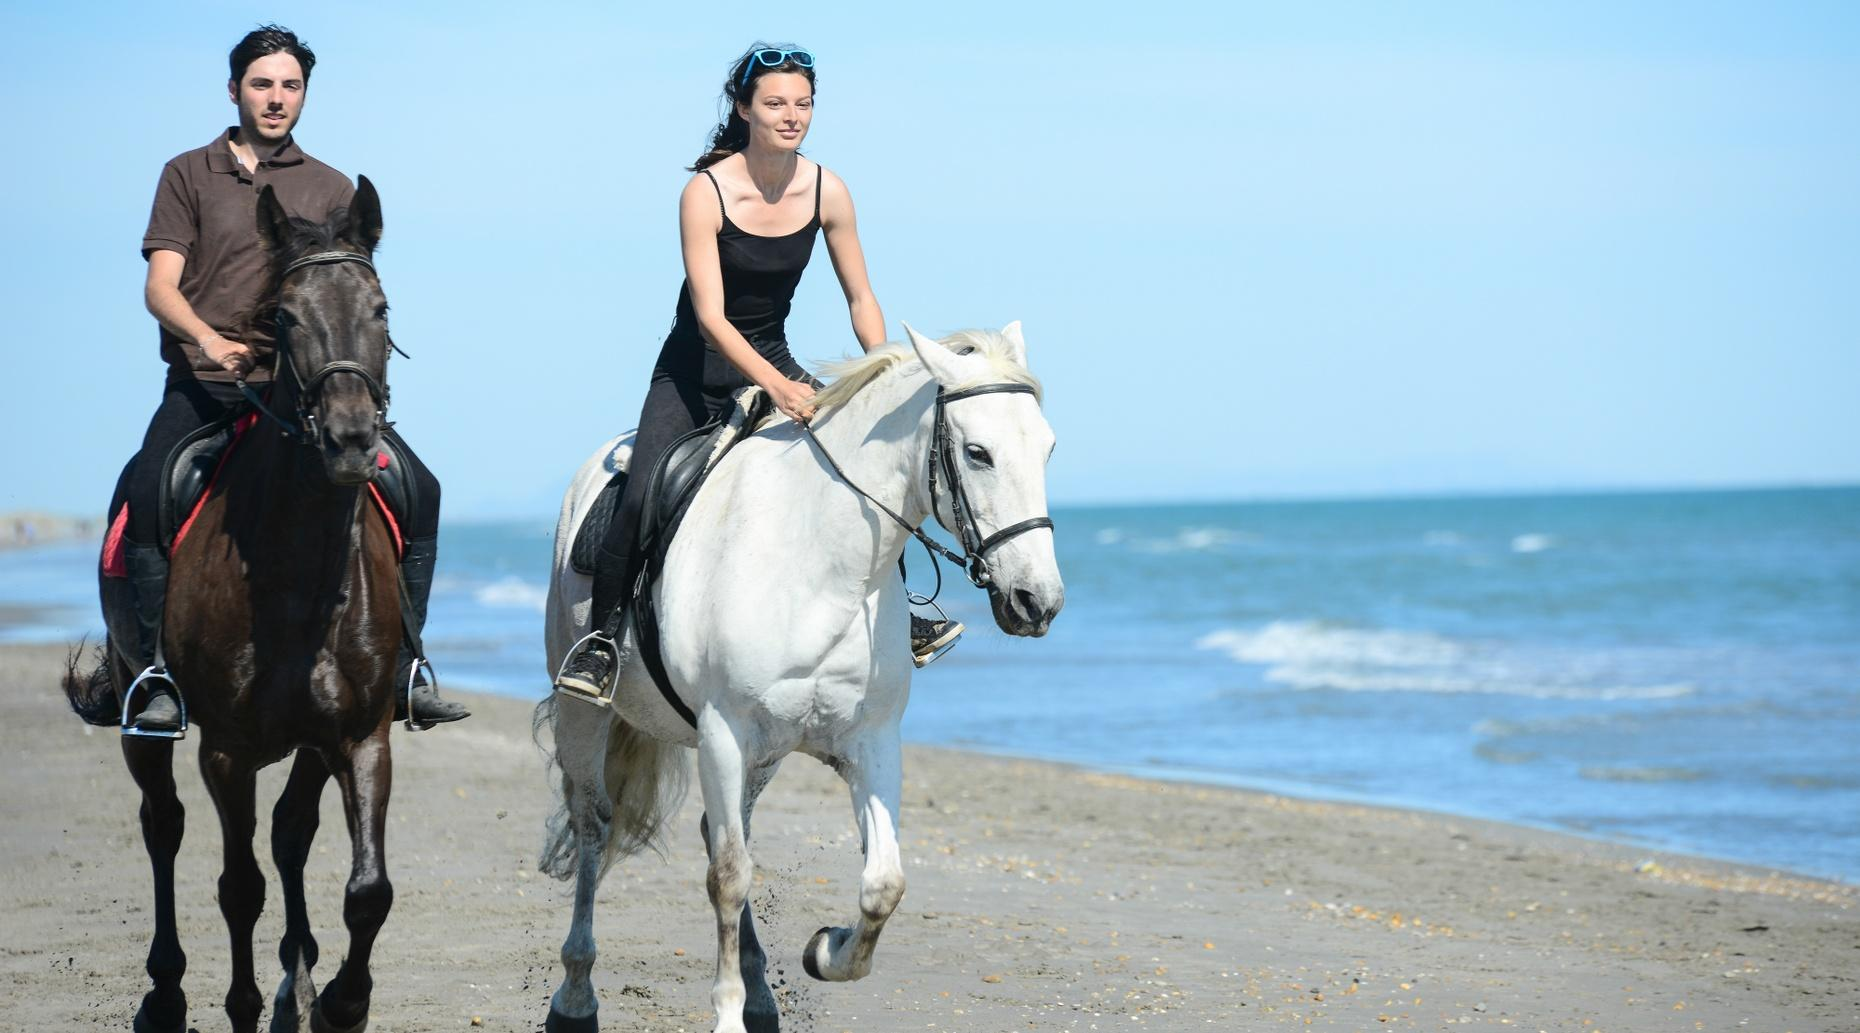 One-Hour Horseback Trail Ride in San Diego